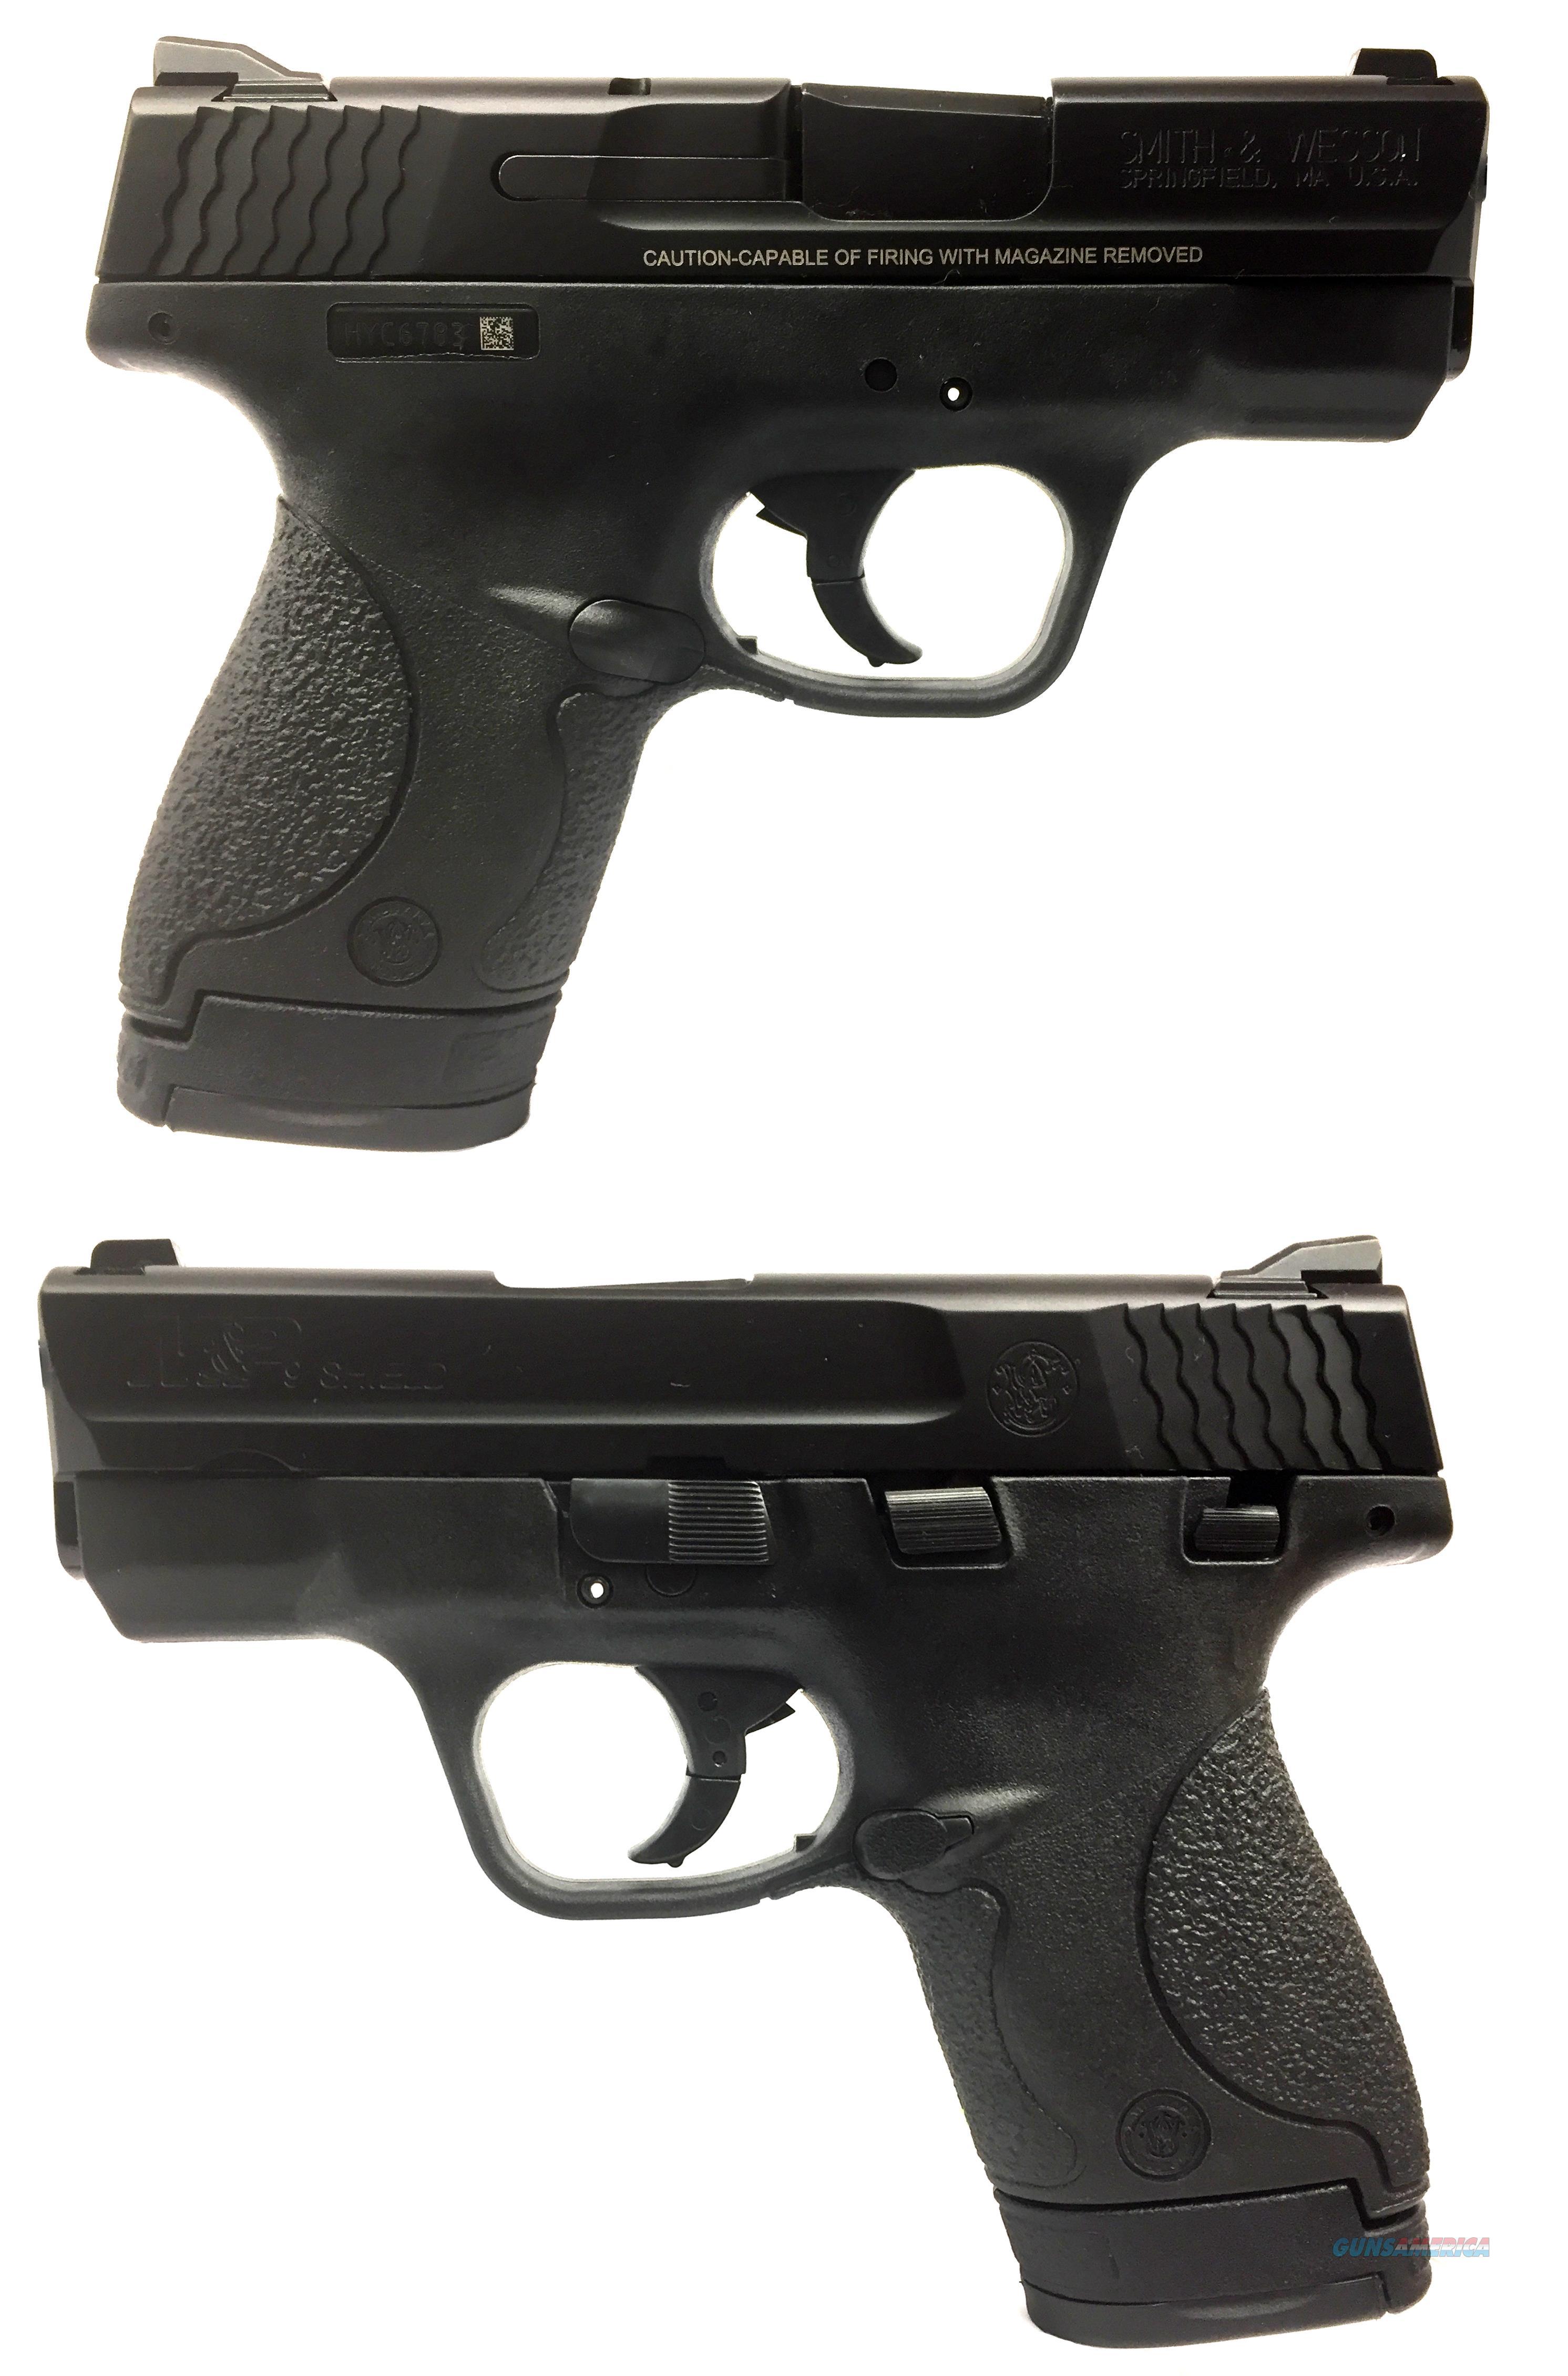 Smith & Wesson M&P9 Shield   Guns > Pistols > Smith & Wesson Pistols - Autos > Shield